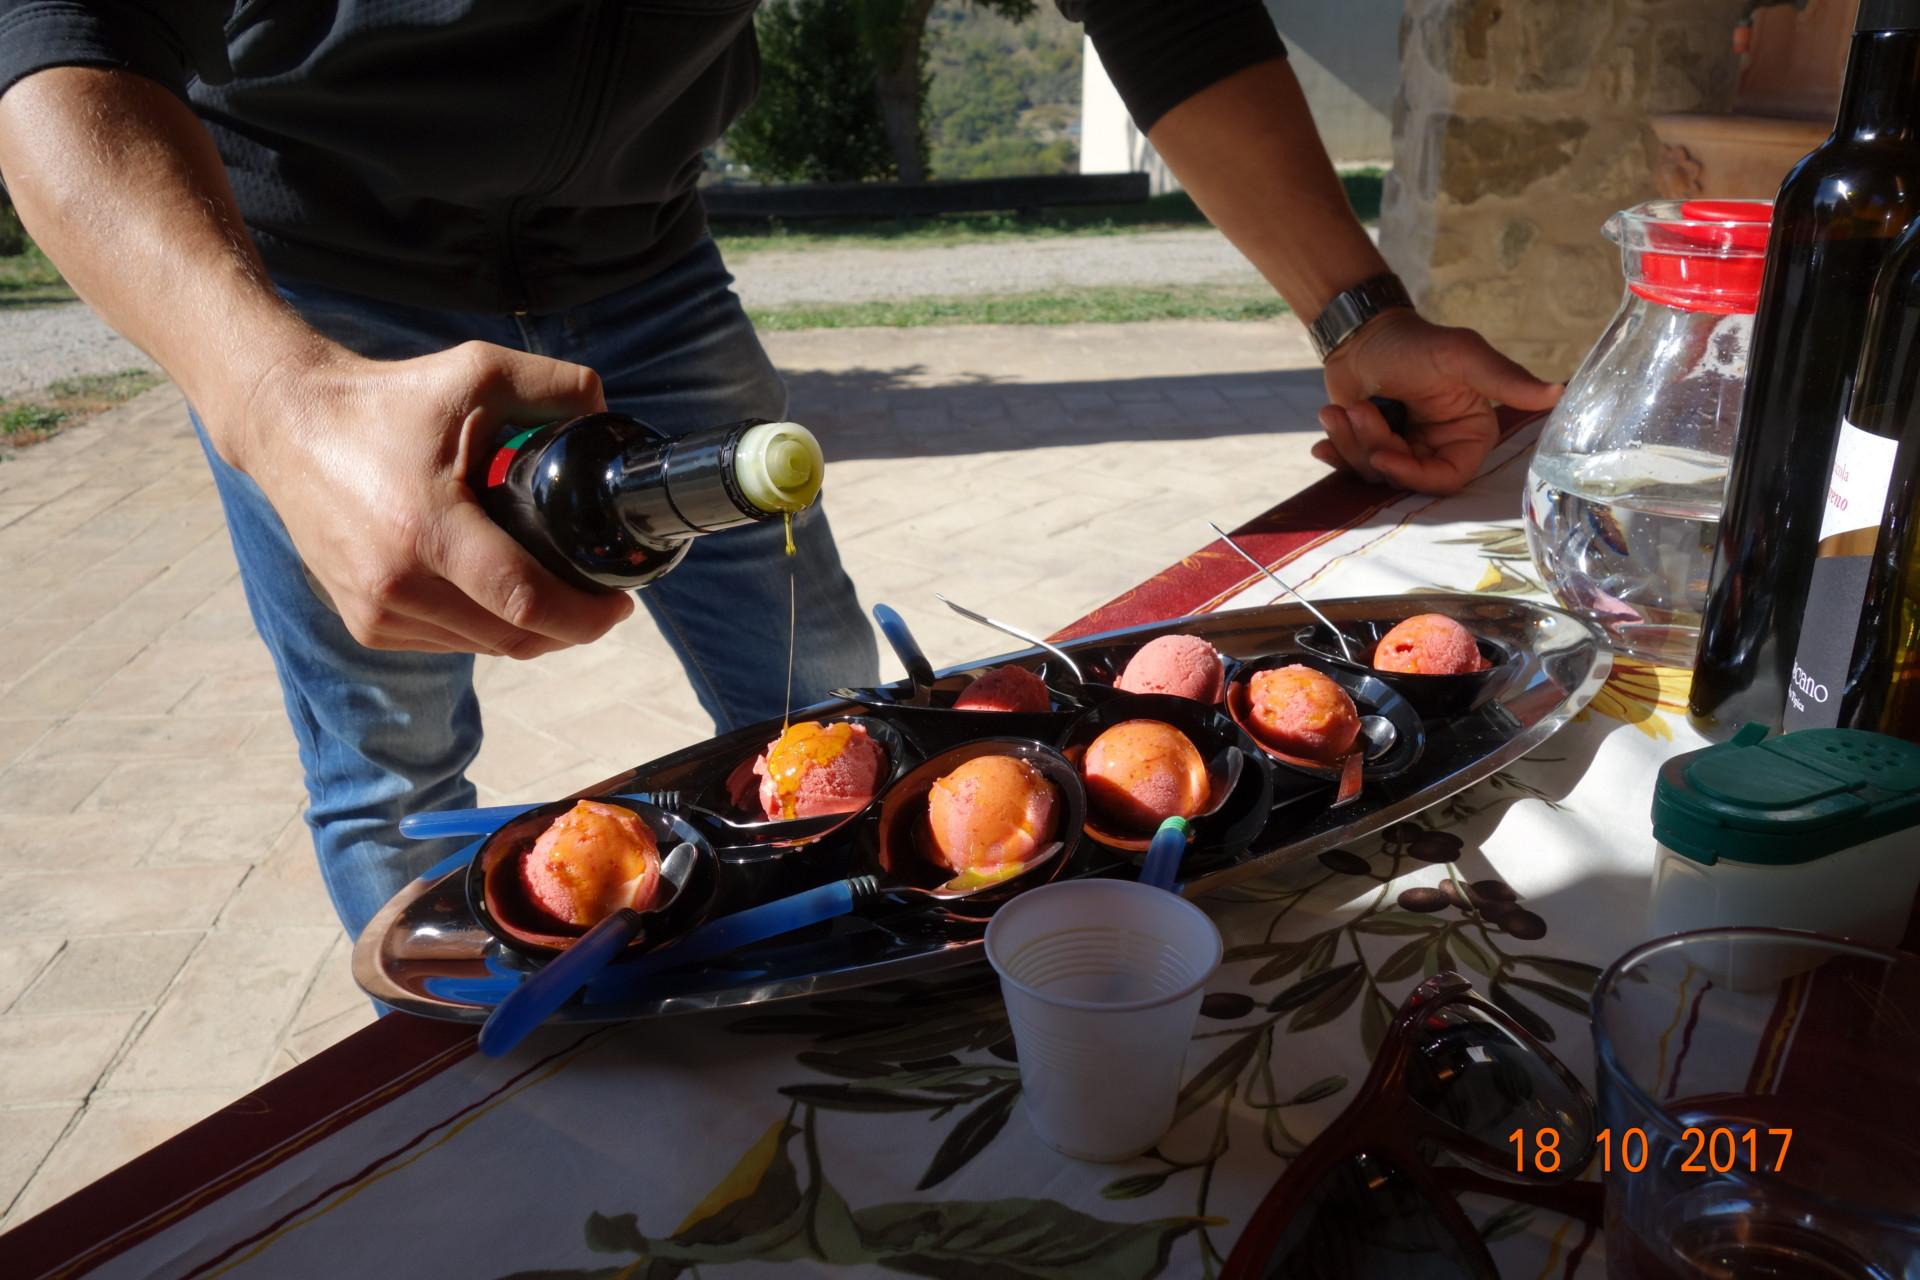 Mirka würzt die Glace mit seinem delikaten Olivenöl